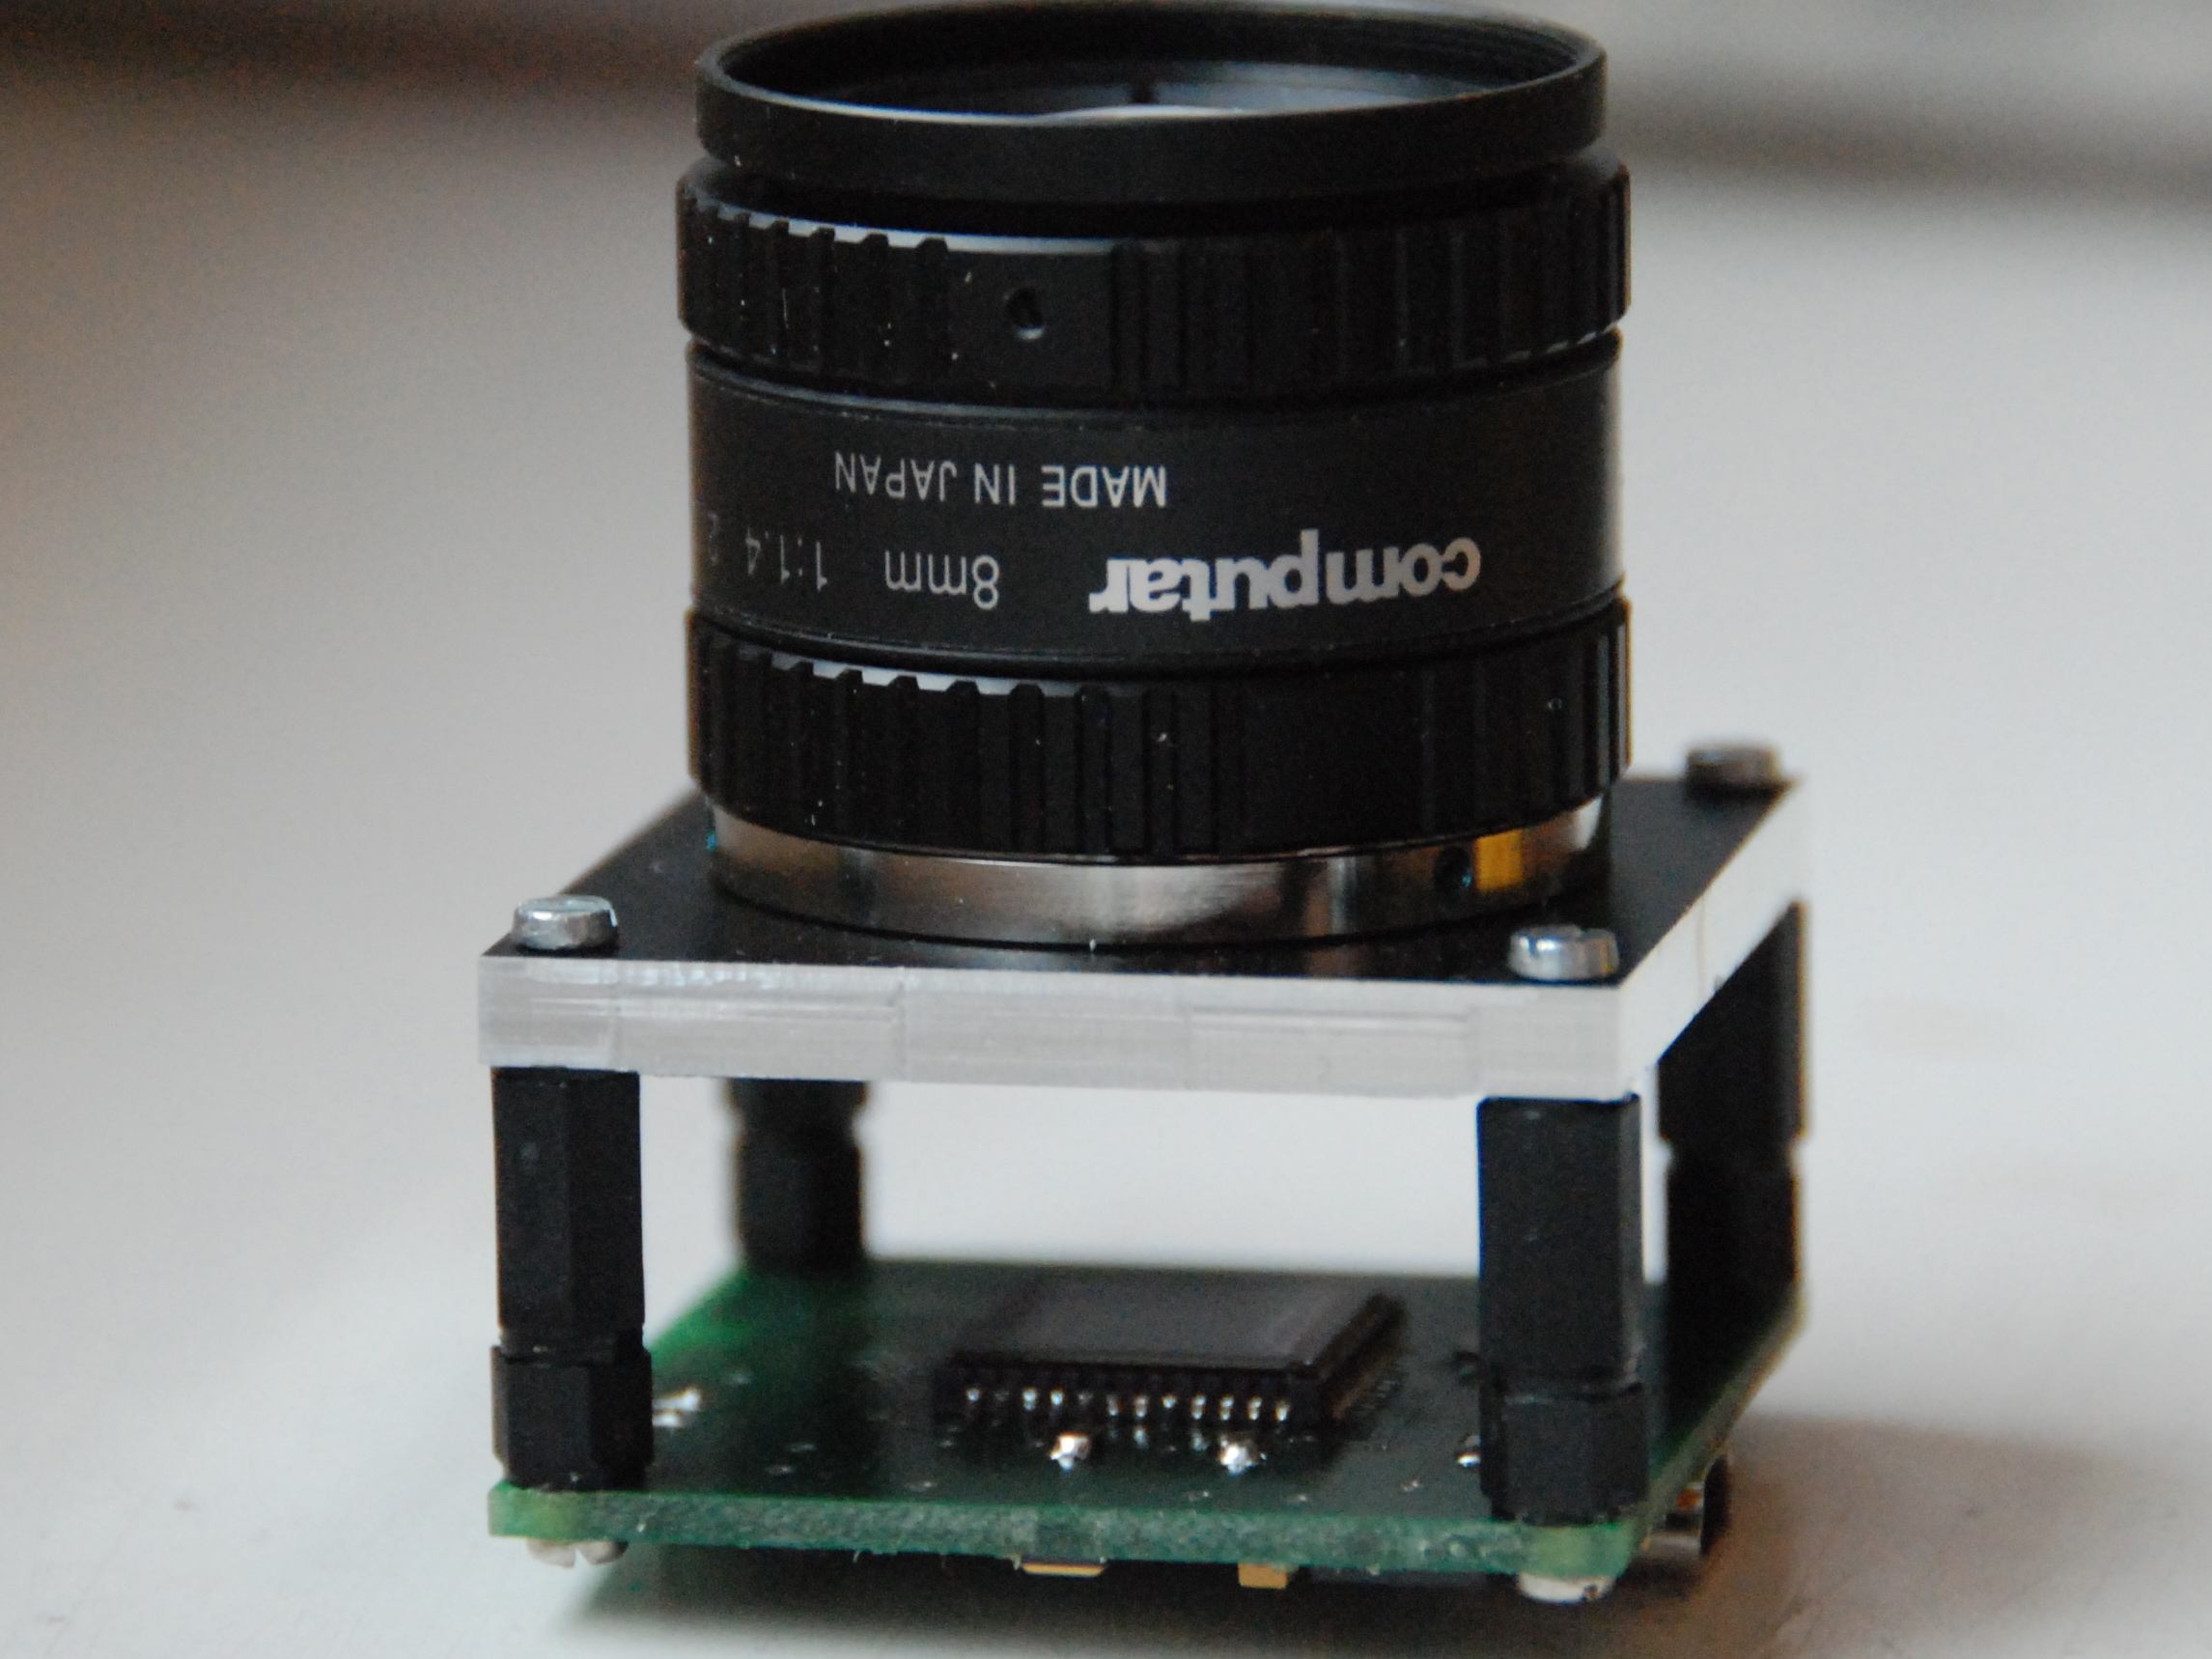 CMOS Bildsensor mit mehr als 25 FPS - Mikrocontroller.net